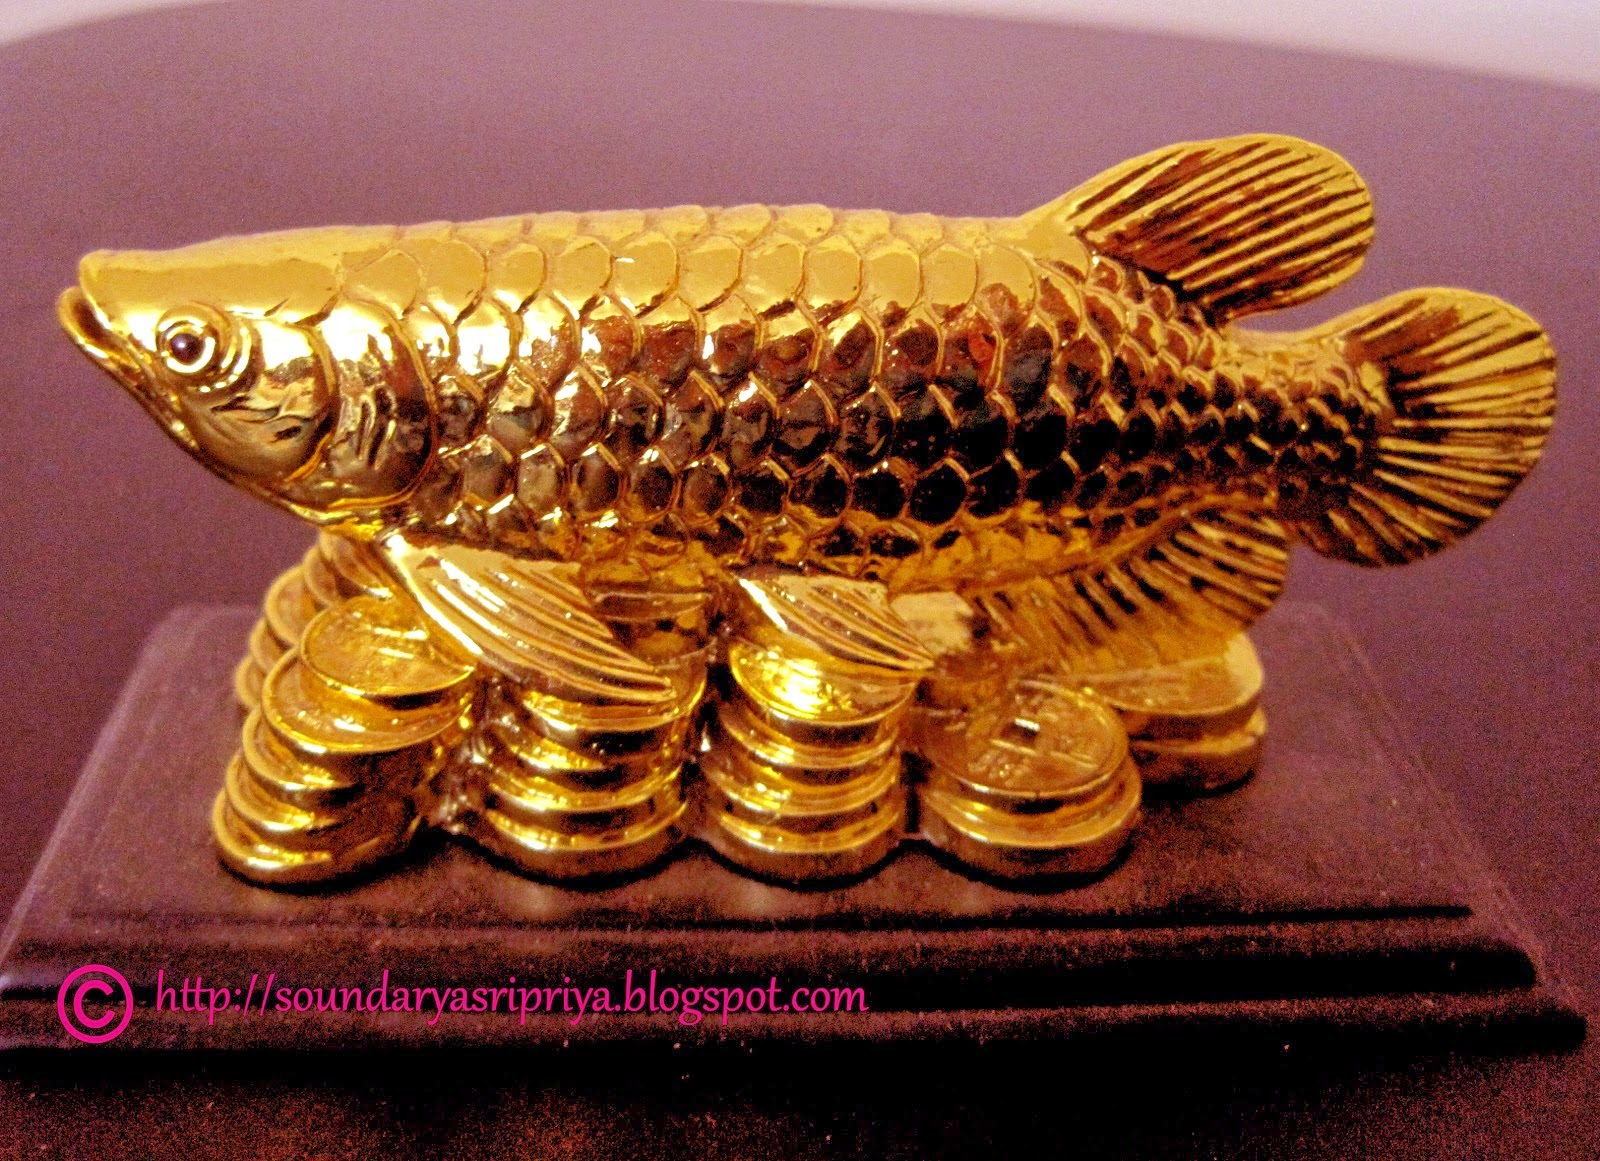 Armonizaci n a trav s del feng shui simbolos de - Feng shui prosperidad ...